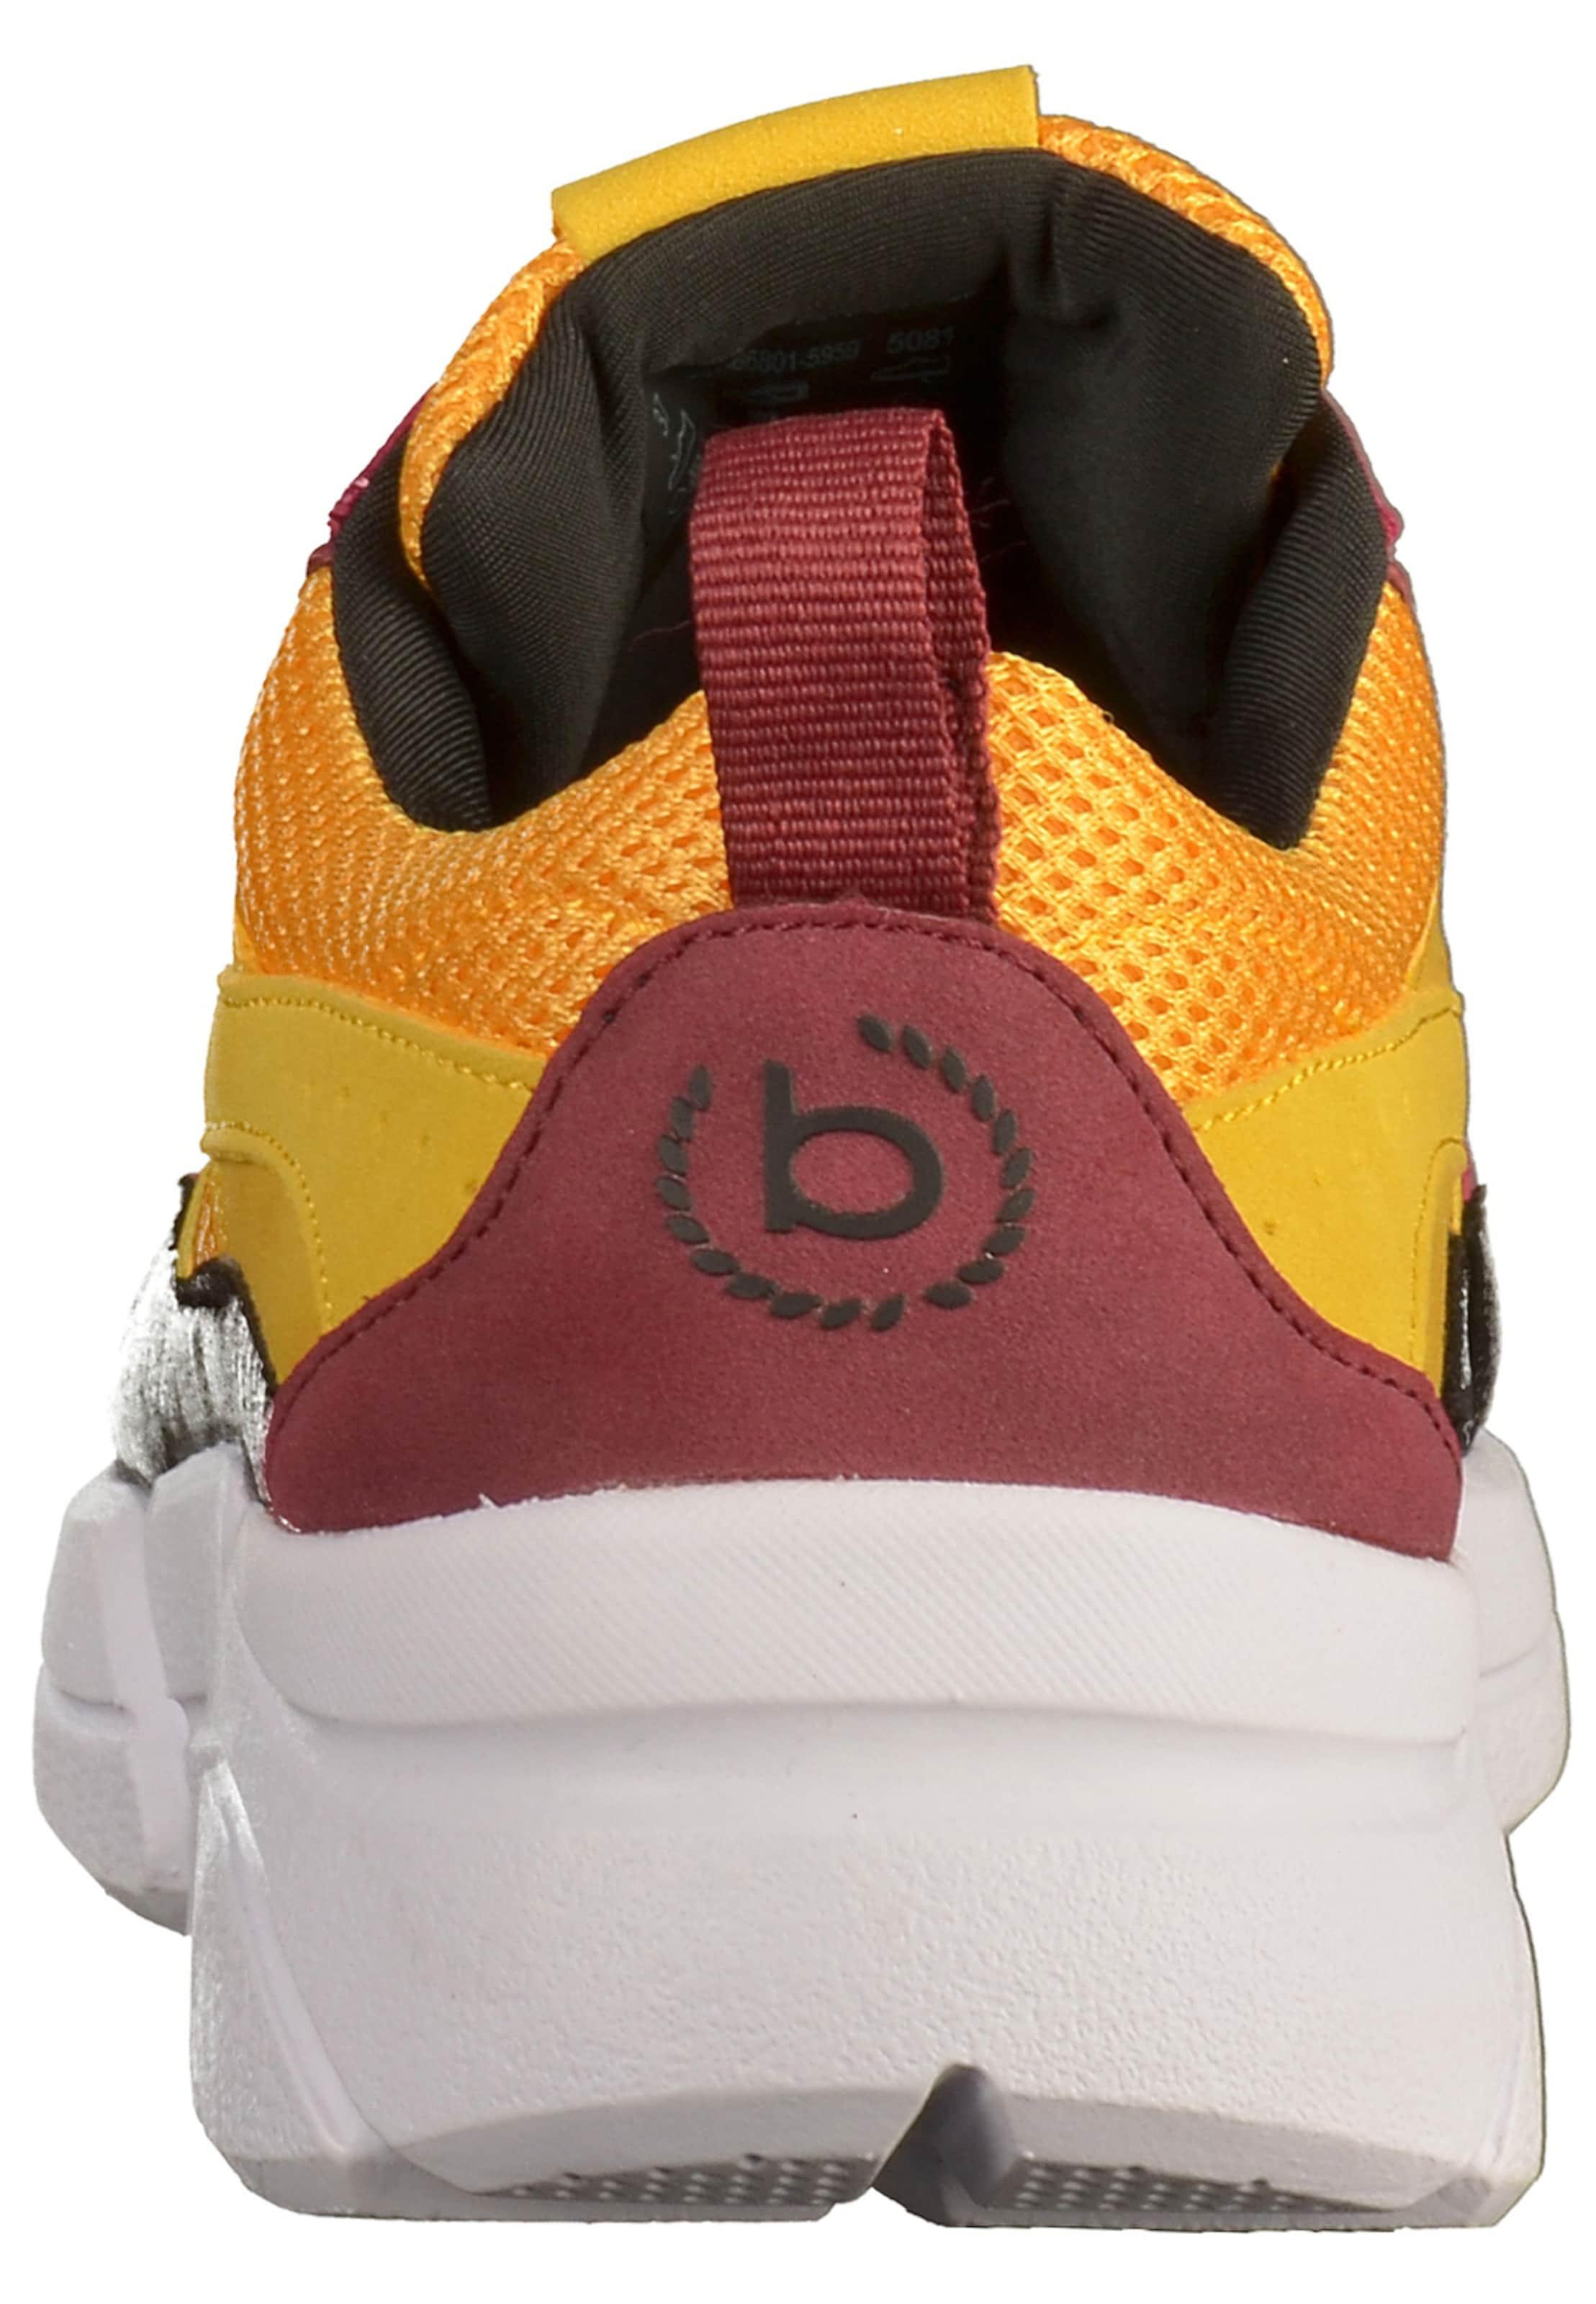 Rose En Baskets Bugatti JauneOrange Basses l1cJFK